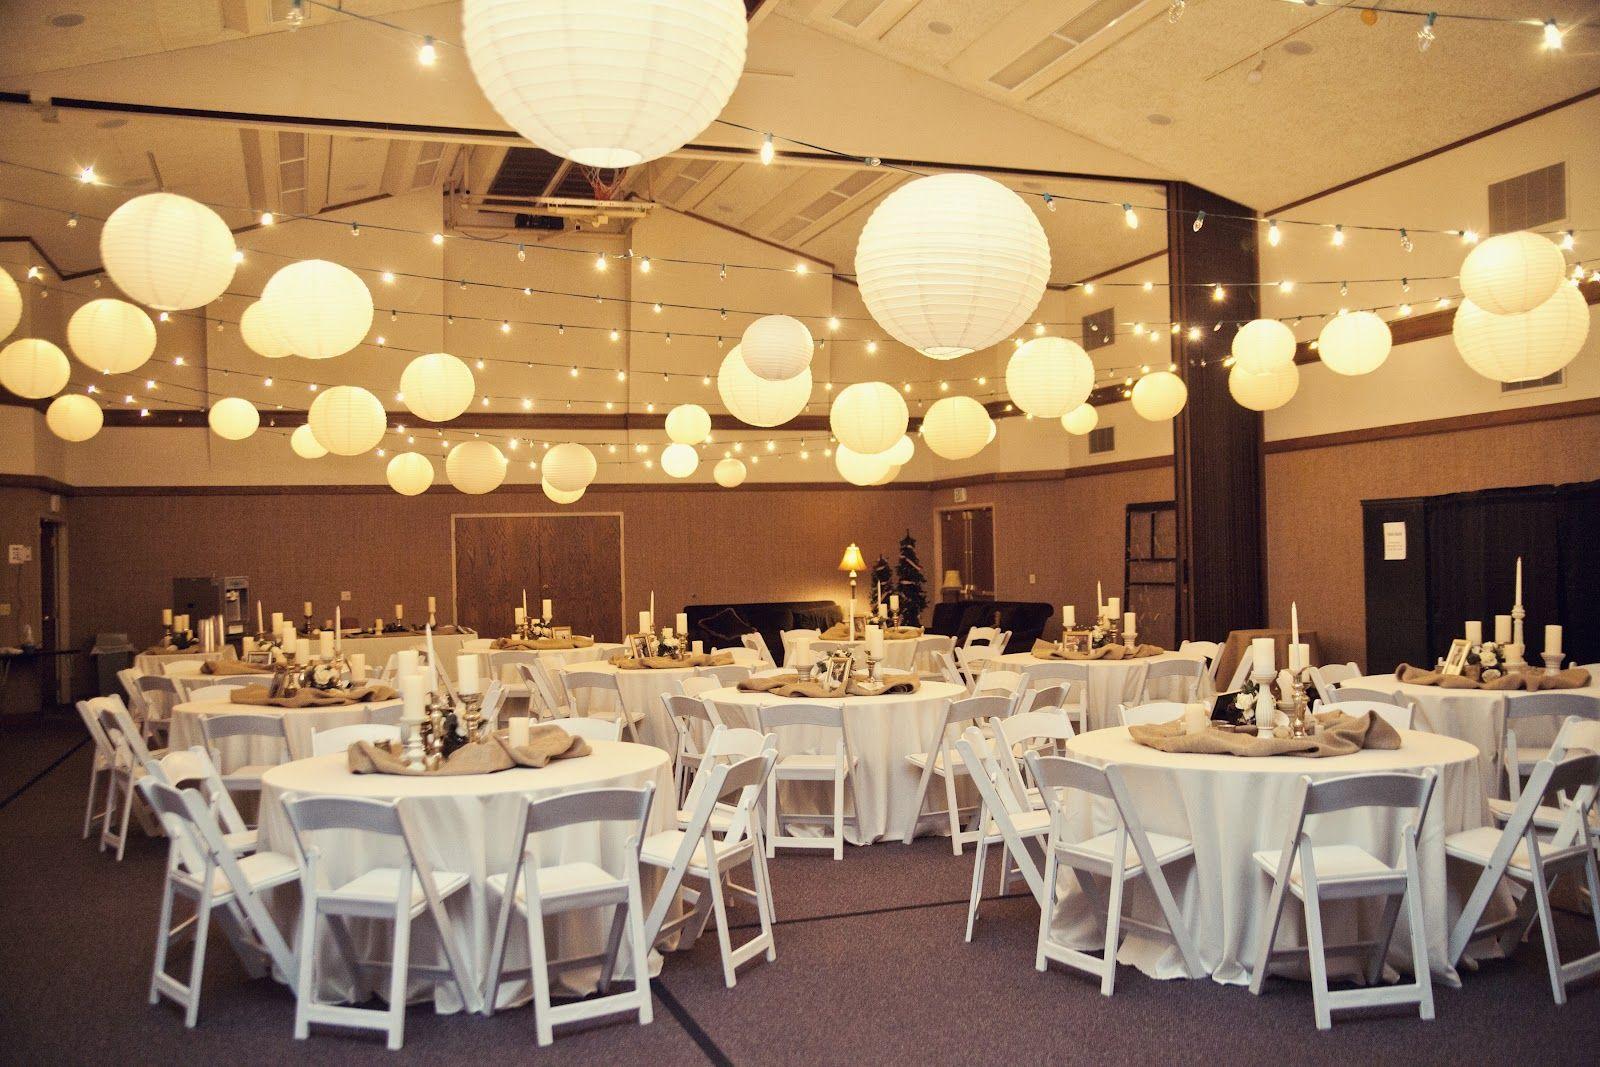 7 Ways To Save Money On Reception Rentals Wedding Reception Hall